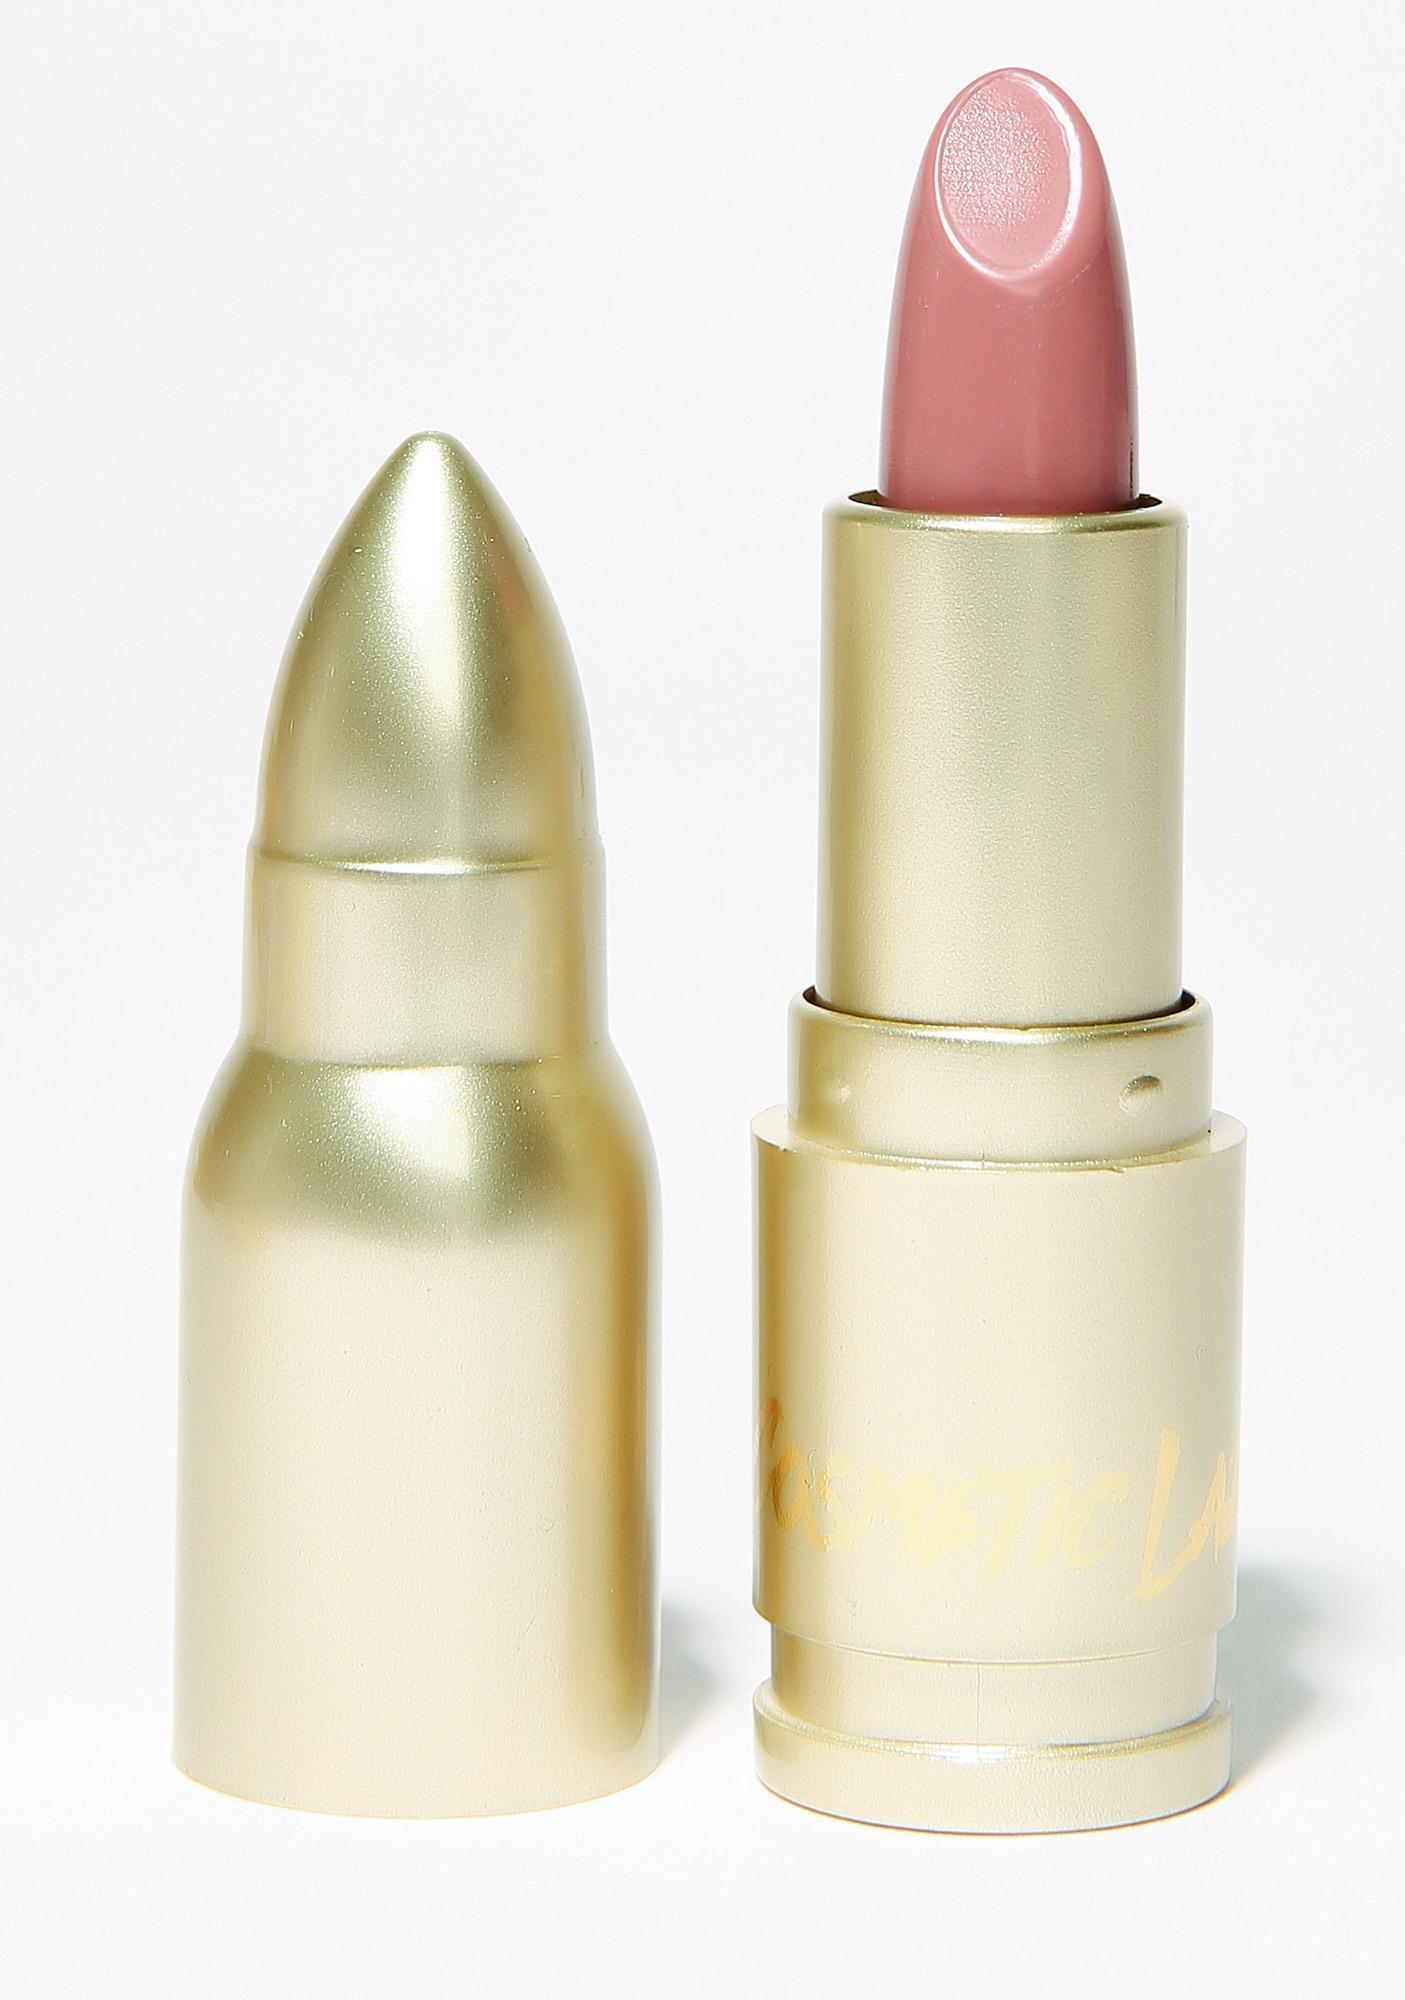 Lunatick Cosmetic Labs Bruja Apocalipstick